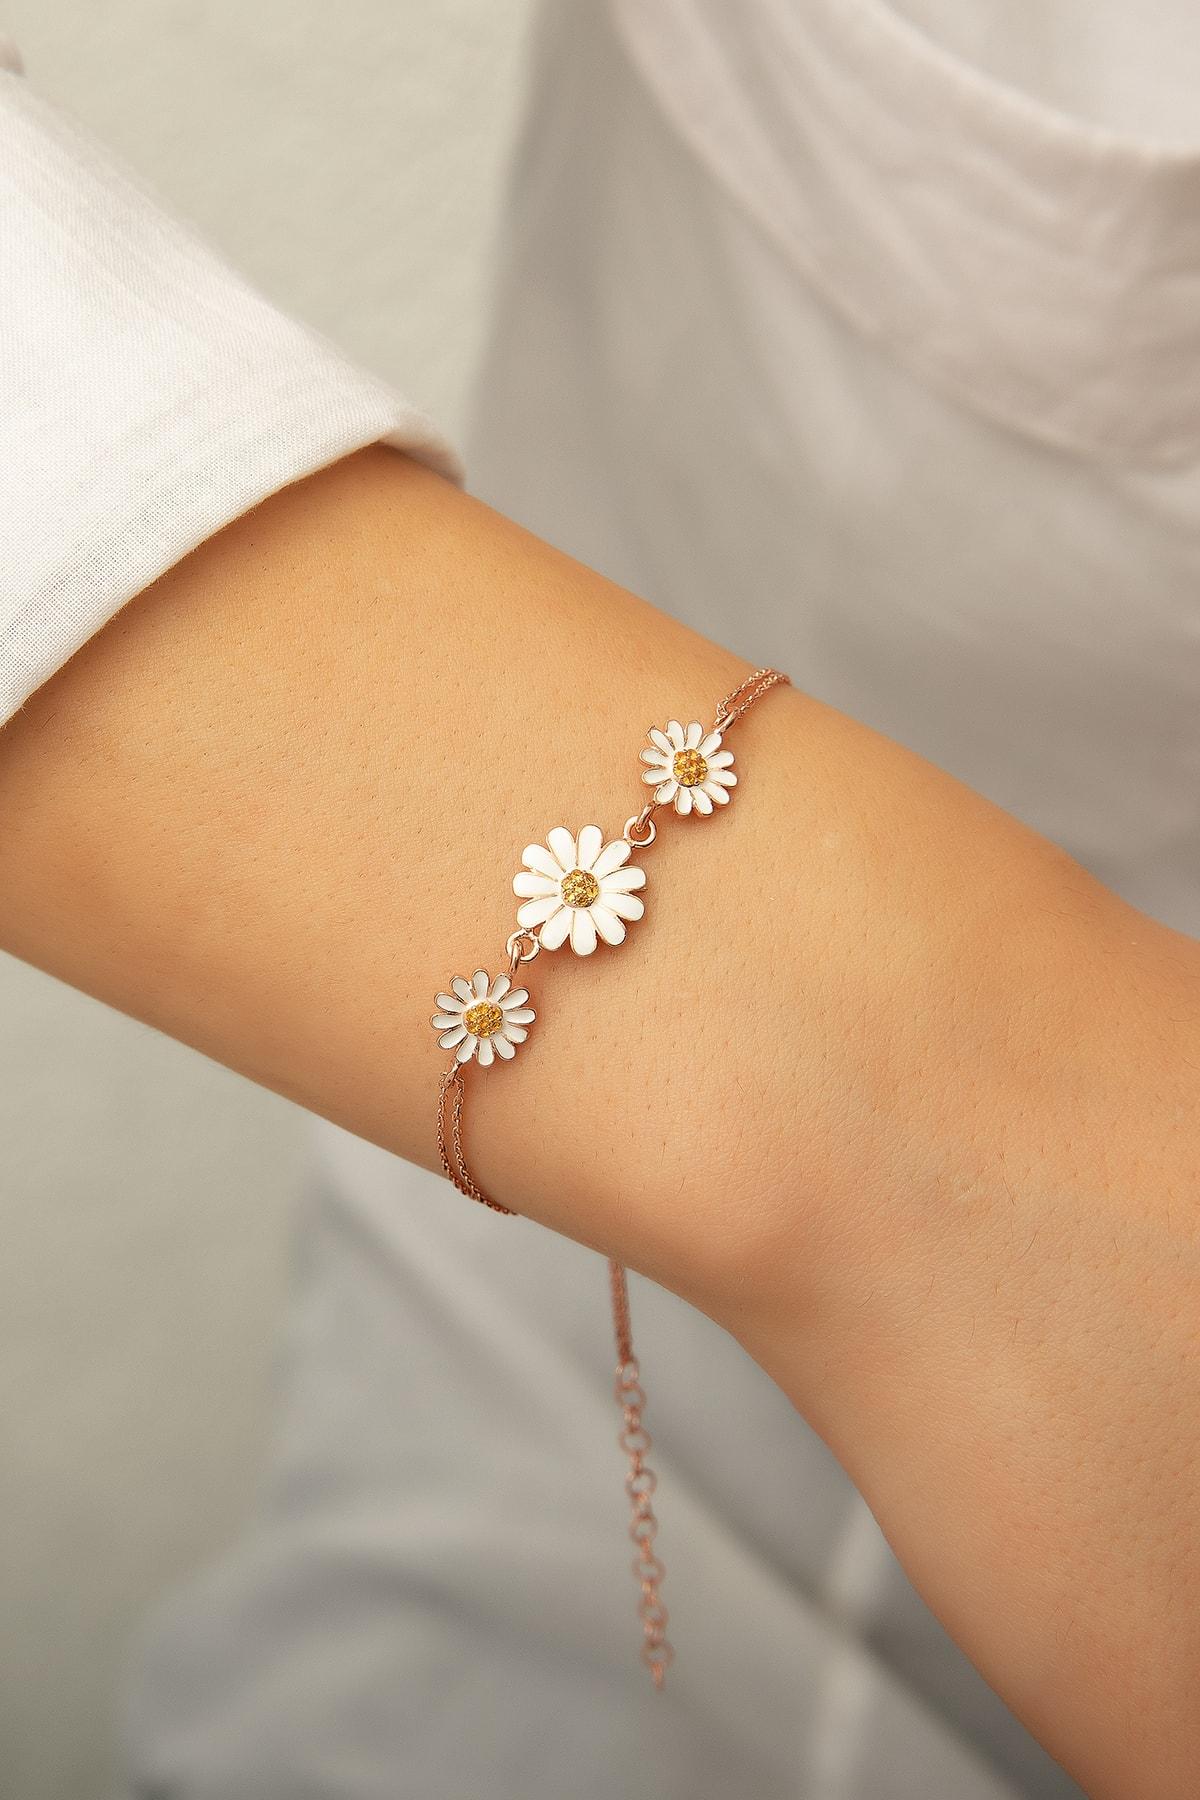 Papatya Silver Üç Papatya Süzme Bileklik - Sarı Nano Zirkon Taşlı Mineli Rose Altın Kaplama 925 Ayar Gümüş 1